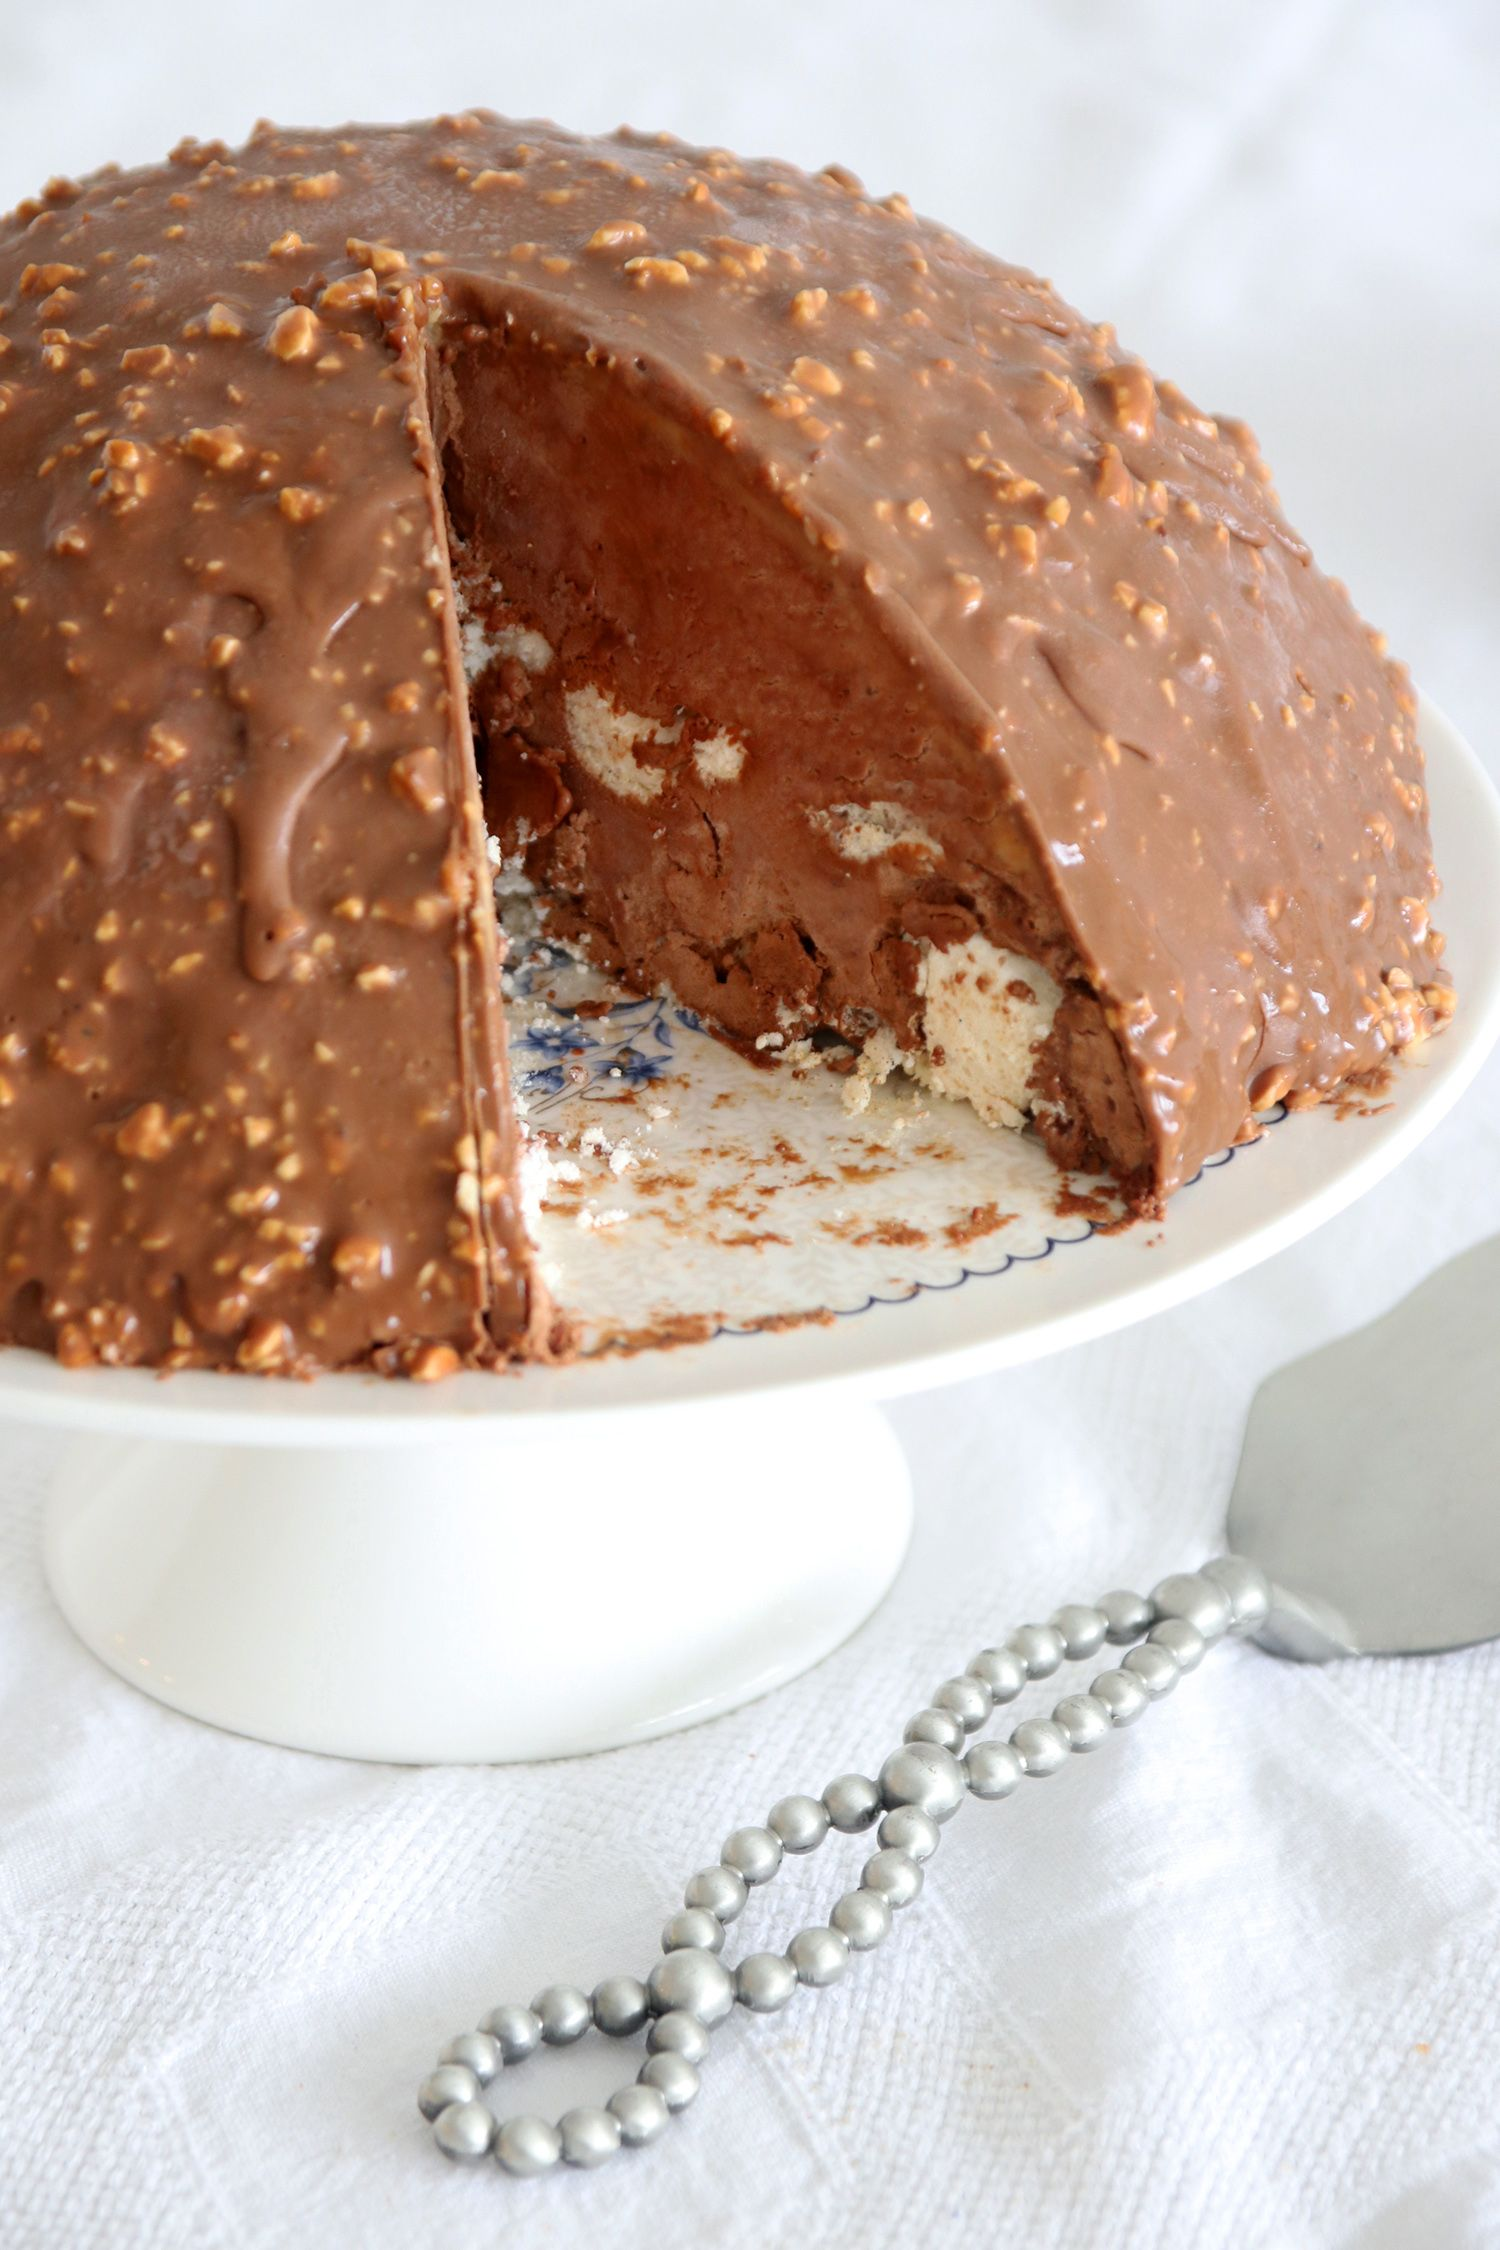 No Bake Chocolate Bomb Cake